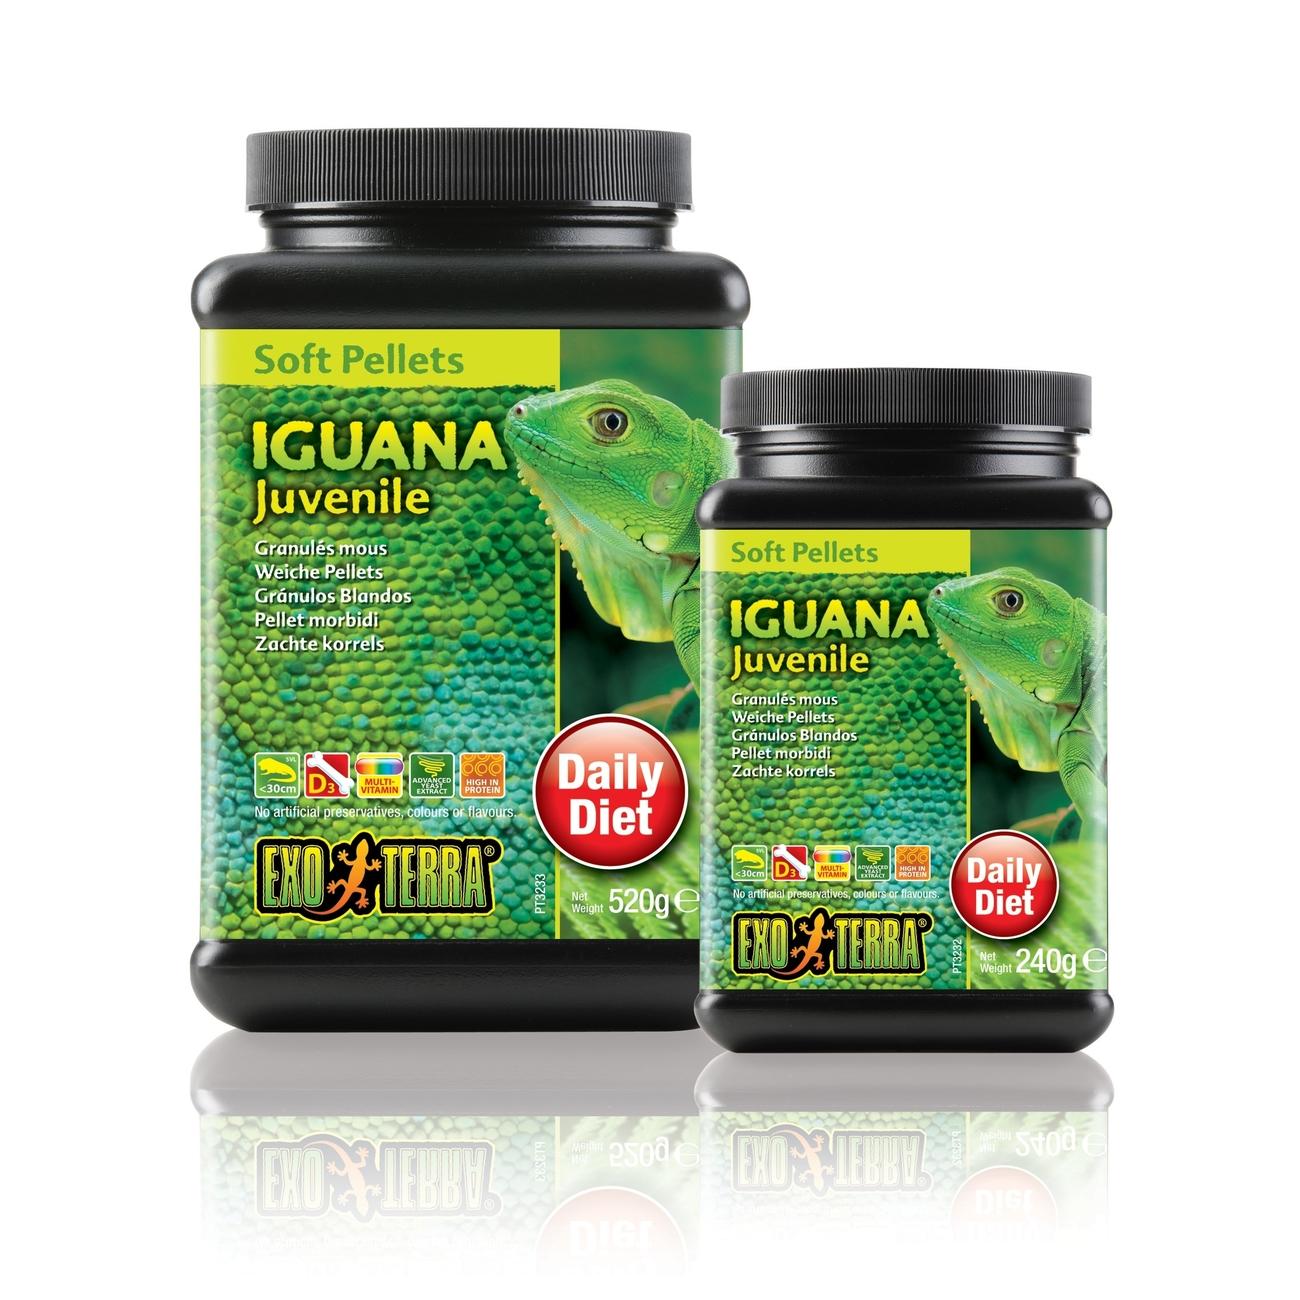 Hagen Exo Terra Futter - Soft Pellets für Leguane, Junior 240 g